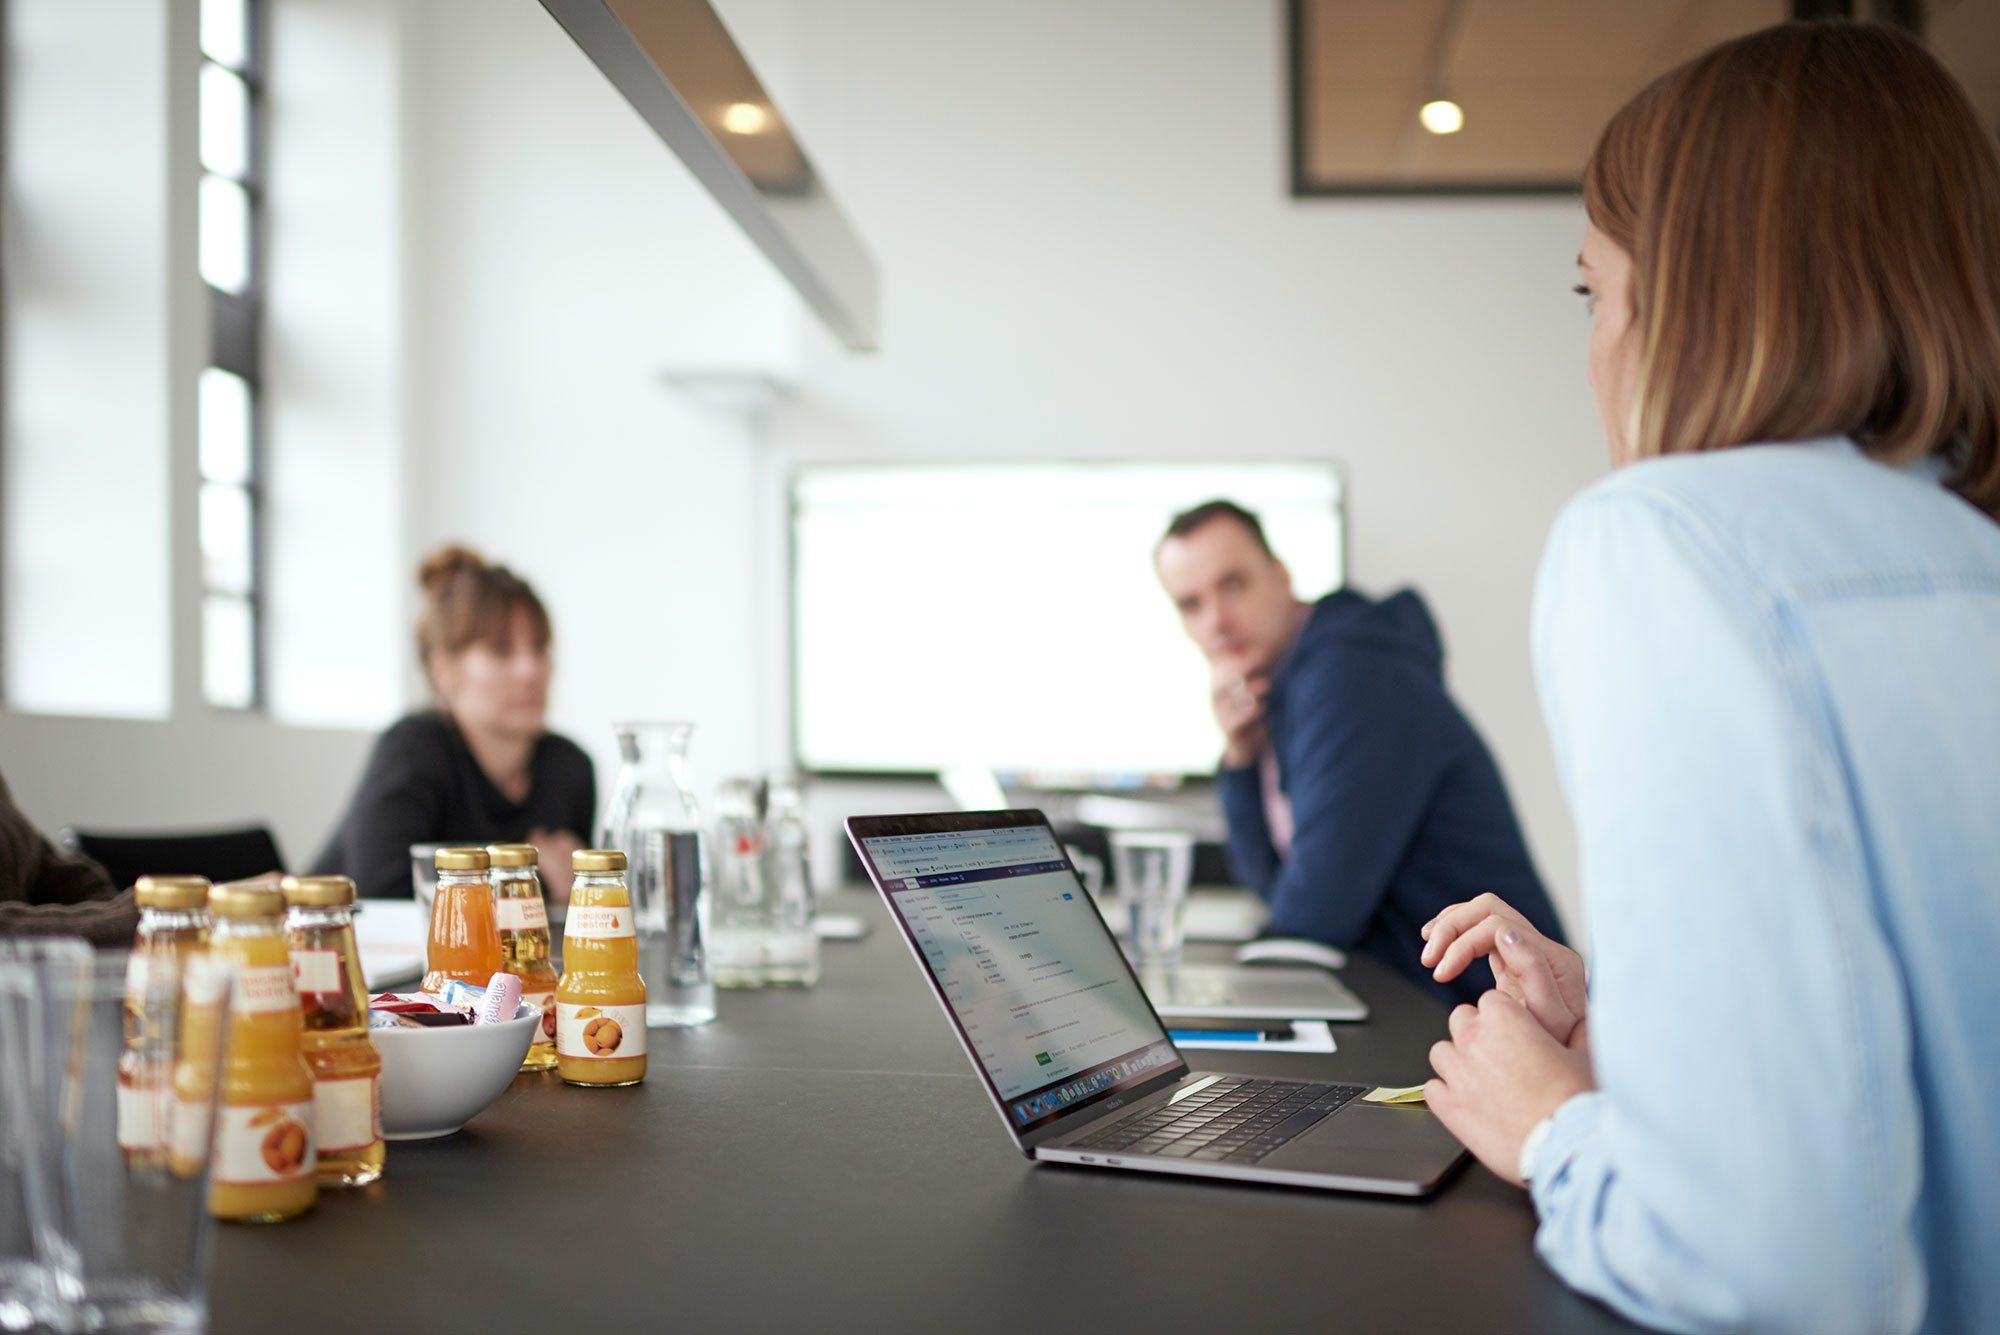 Team-Besprechung im Konferenzraum